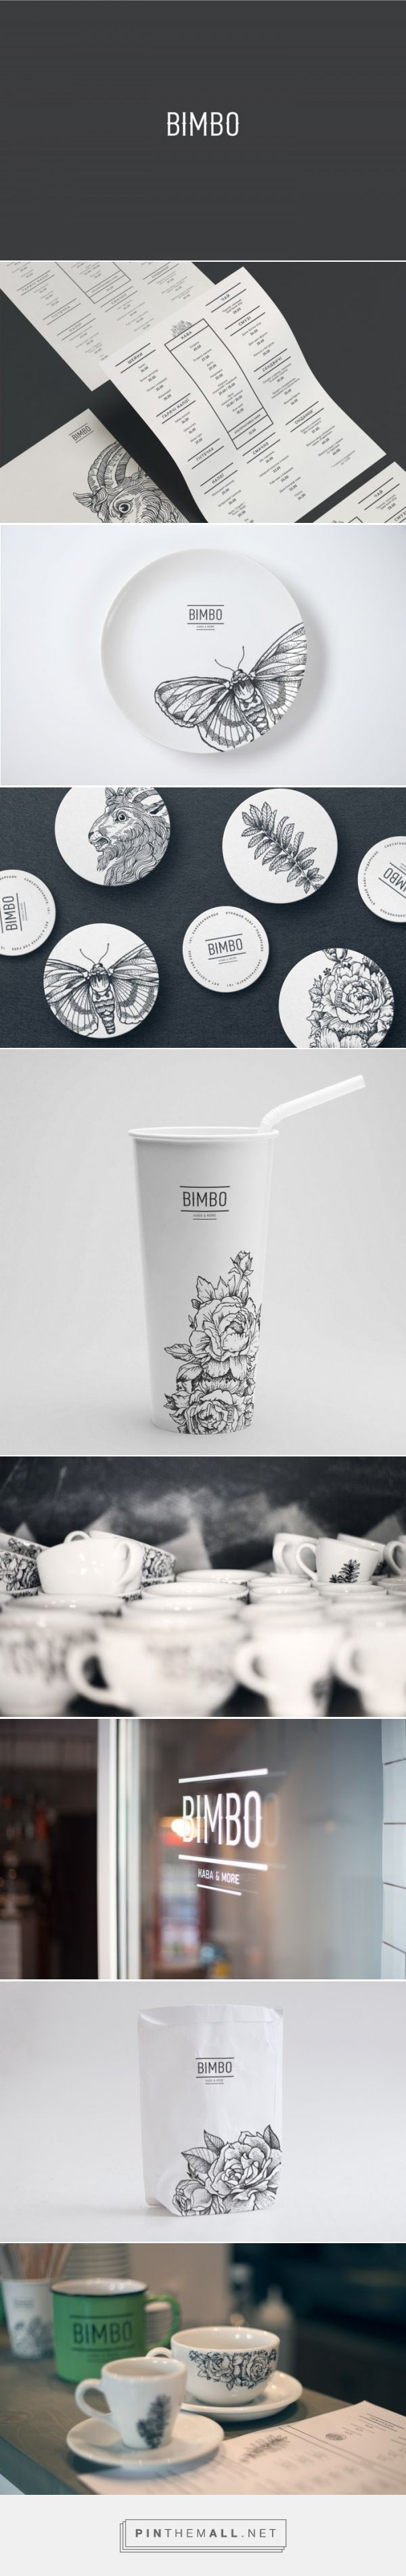 Bimbo Coffee Bar Branding by Grits + Grids | Fivestar Branding – Design and Branding Agency & Inspiration Gallery